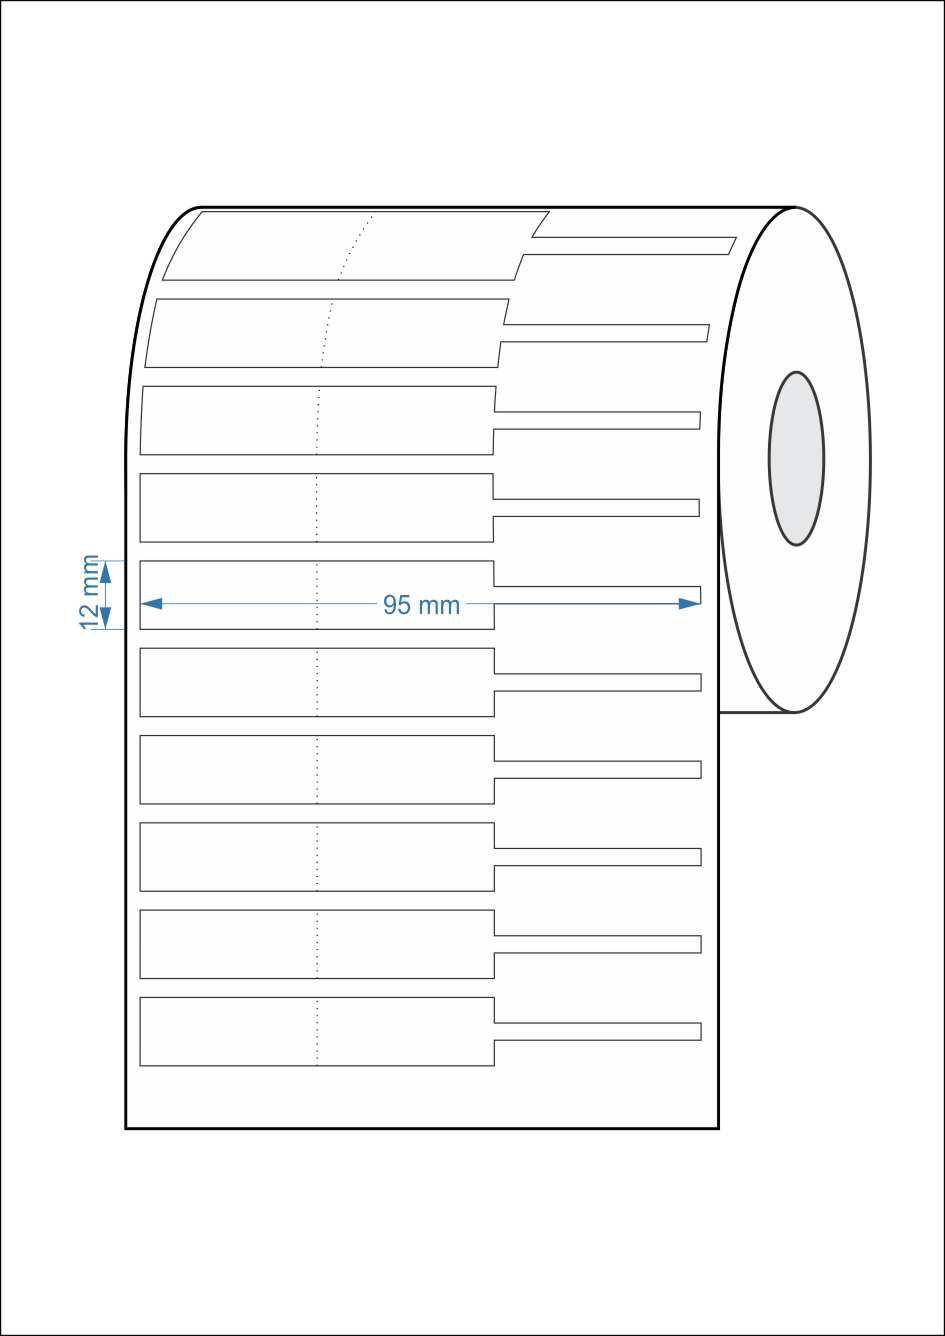 Etiquetas Adesivas para Joias e Otica Bopp 95mx12mm 2000un - 10 Rolos